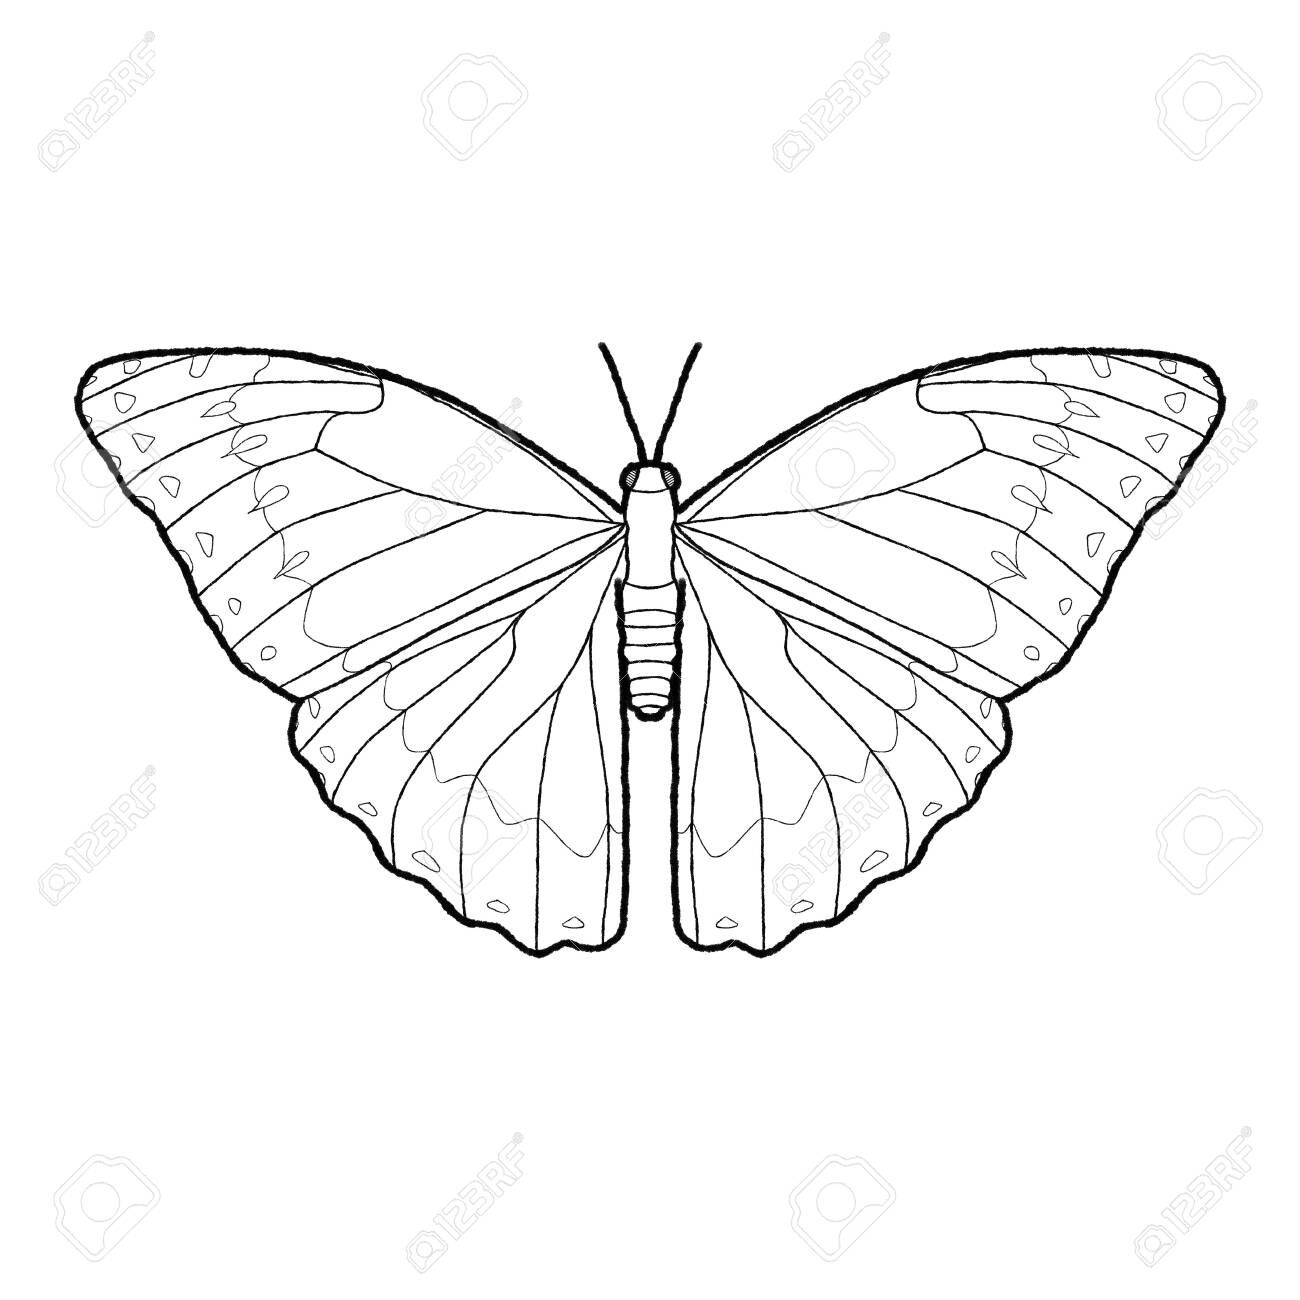 Blue Morpho Butterfly Animal Vector Illustration Hand Drawn Cartoon Art Sponsored Animal Animal Vector Illustration Animal Vector Blue Morpho Butterfly